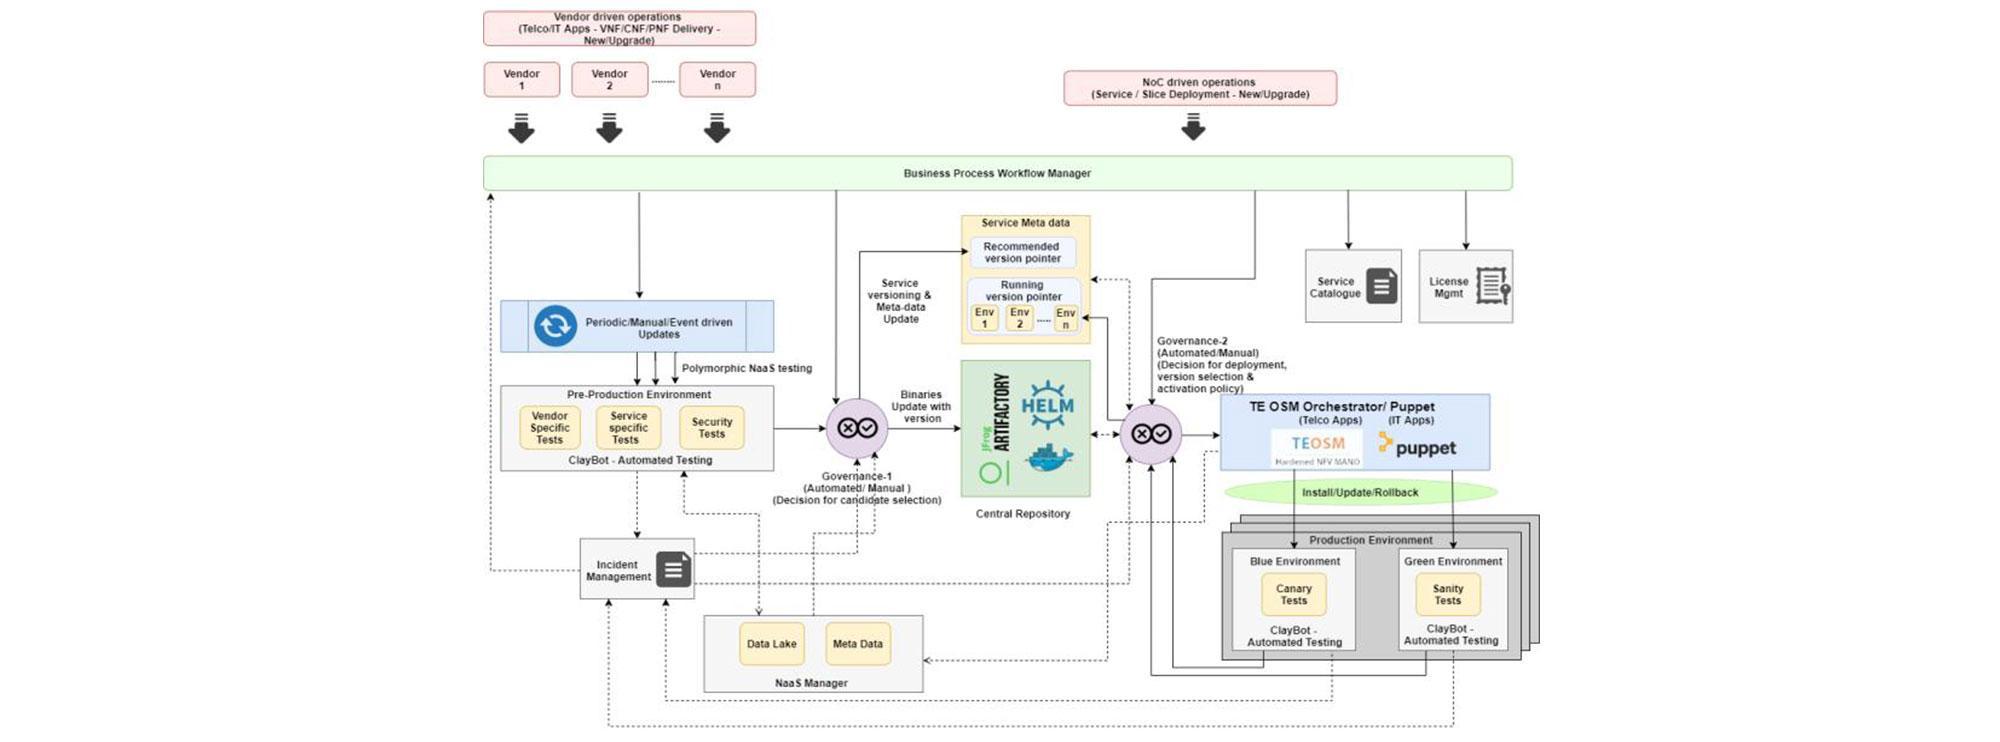 Intelligent network operations